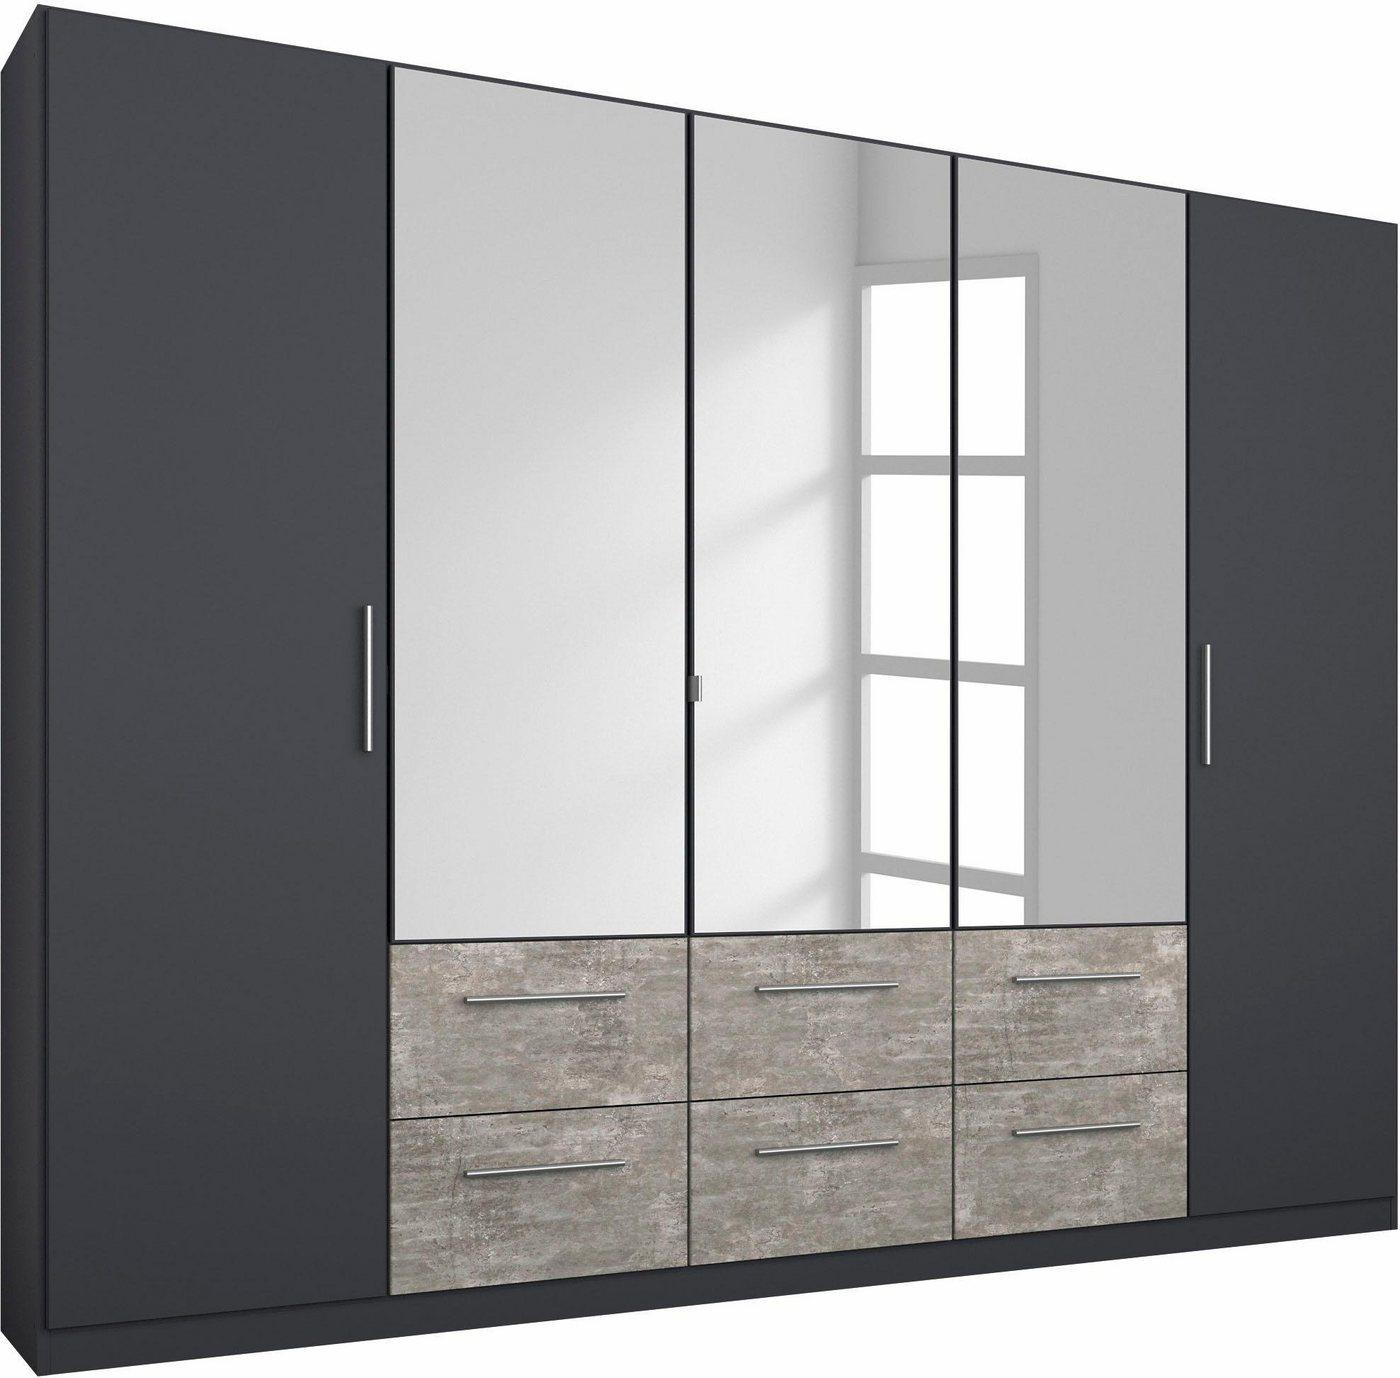 RAUCH garderobekast Siegen, met spiegel en laden